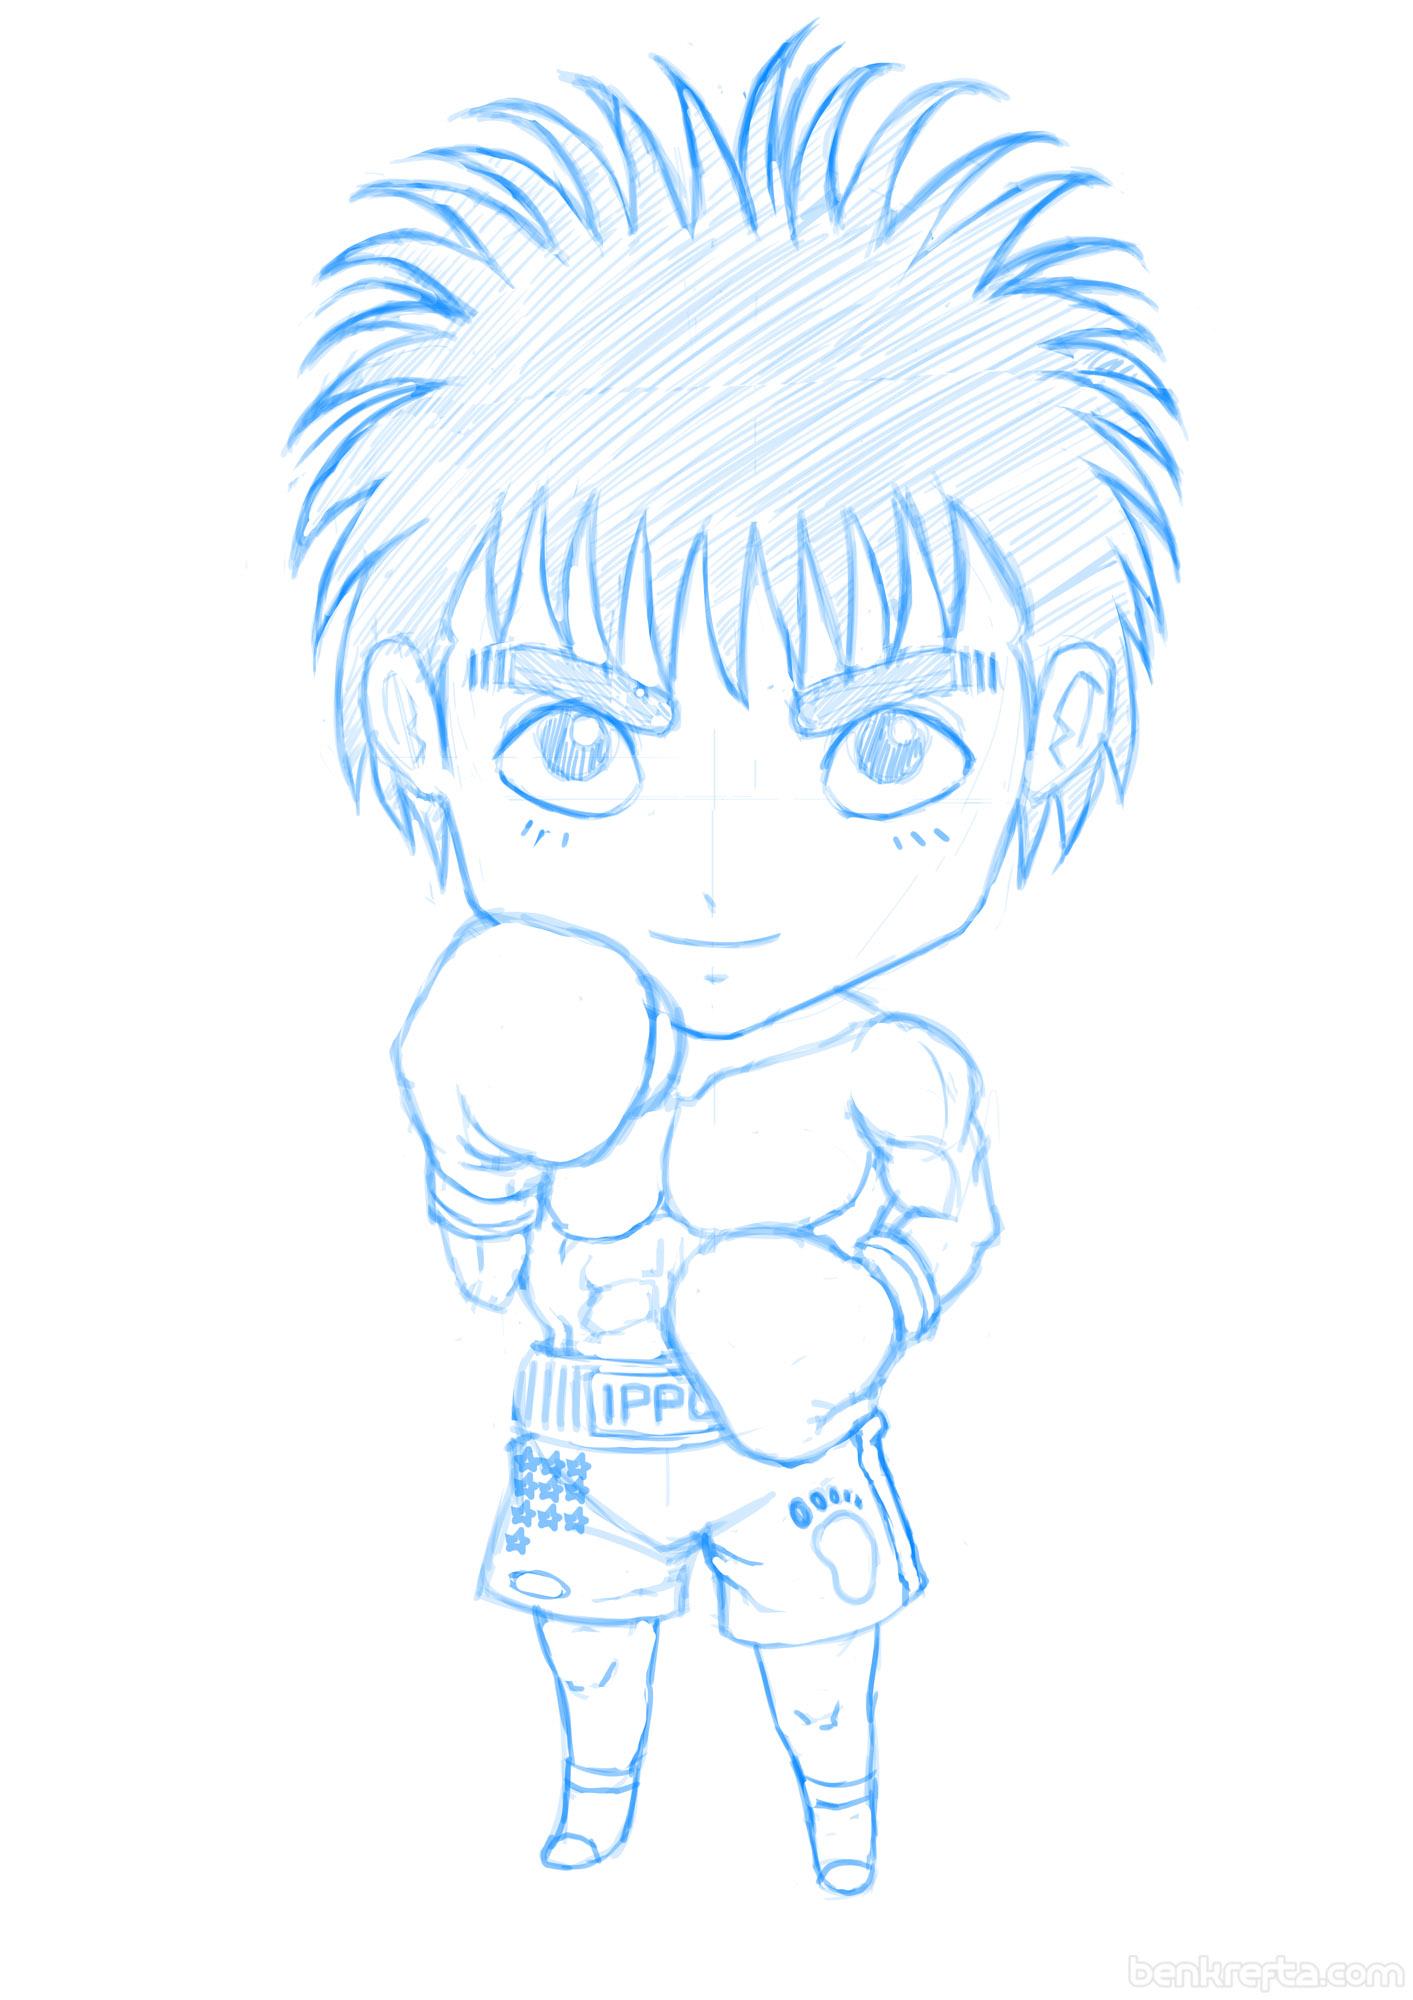 Ippo chibi sketch